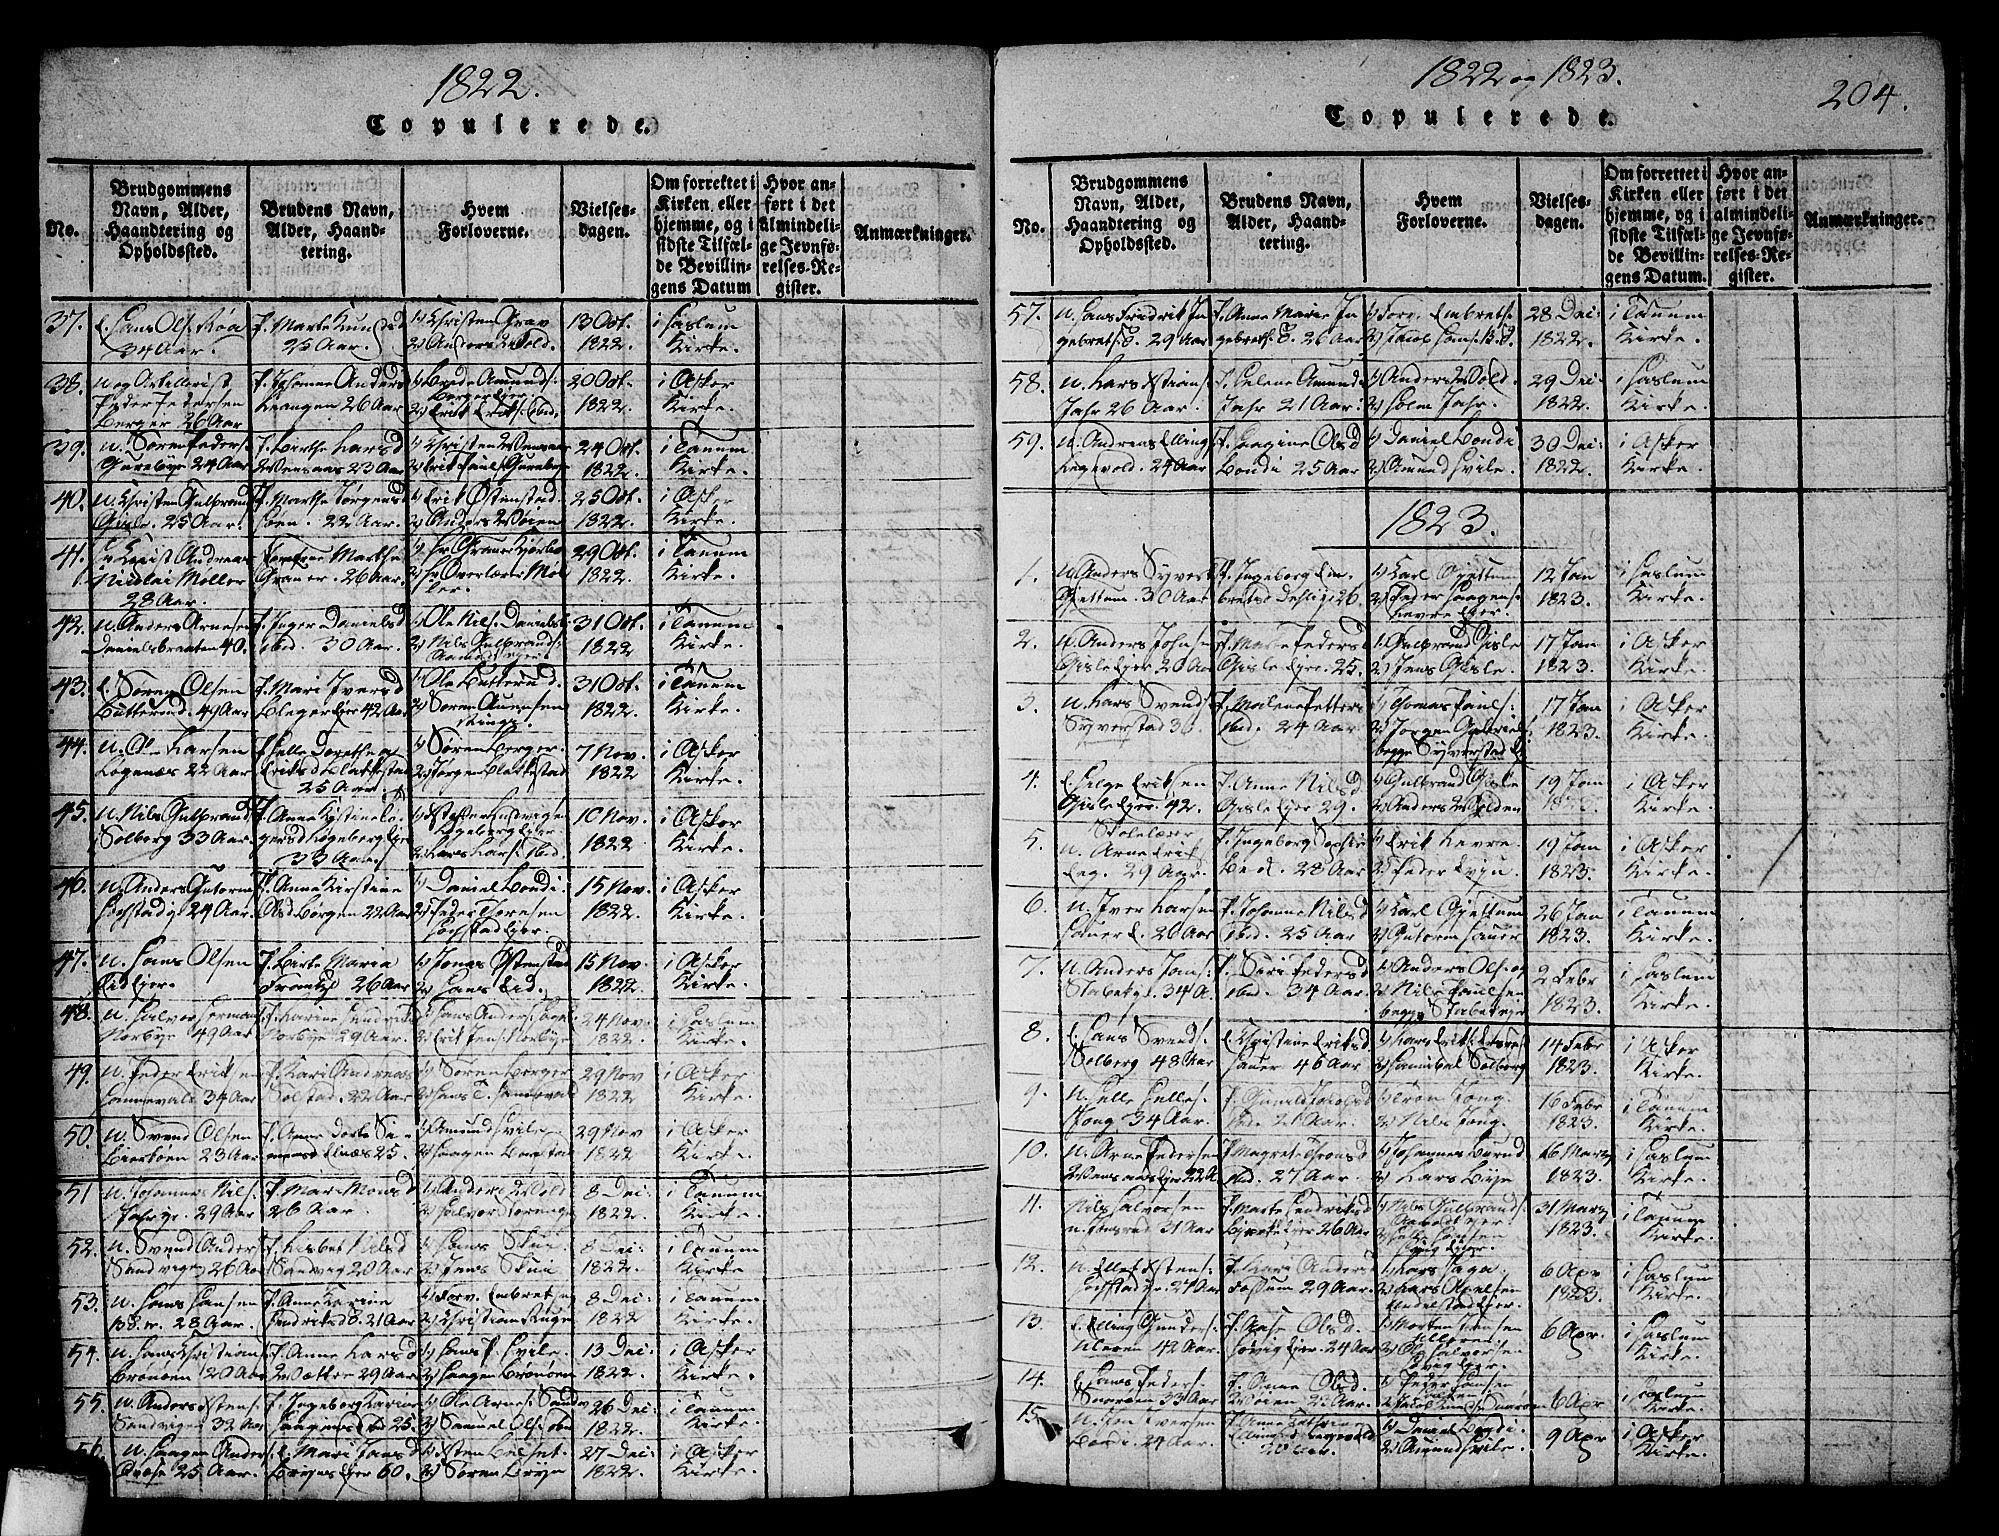 SAO, Asker prestekontor Kirkebøker, G/Ga/L0001: Klokkerbok nr. I 1, 1814-1830, s. 204